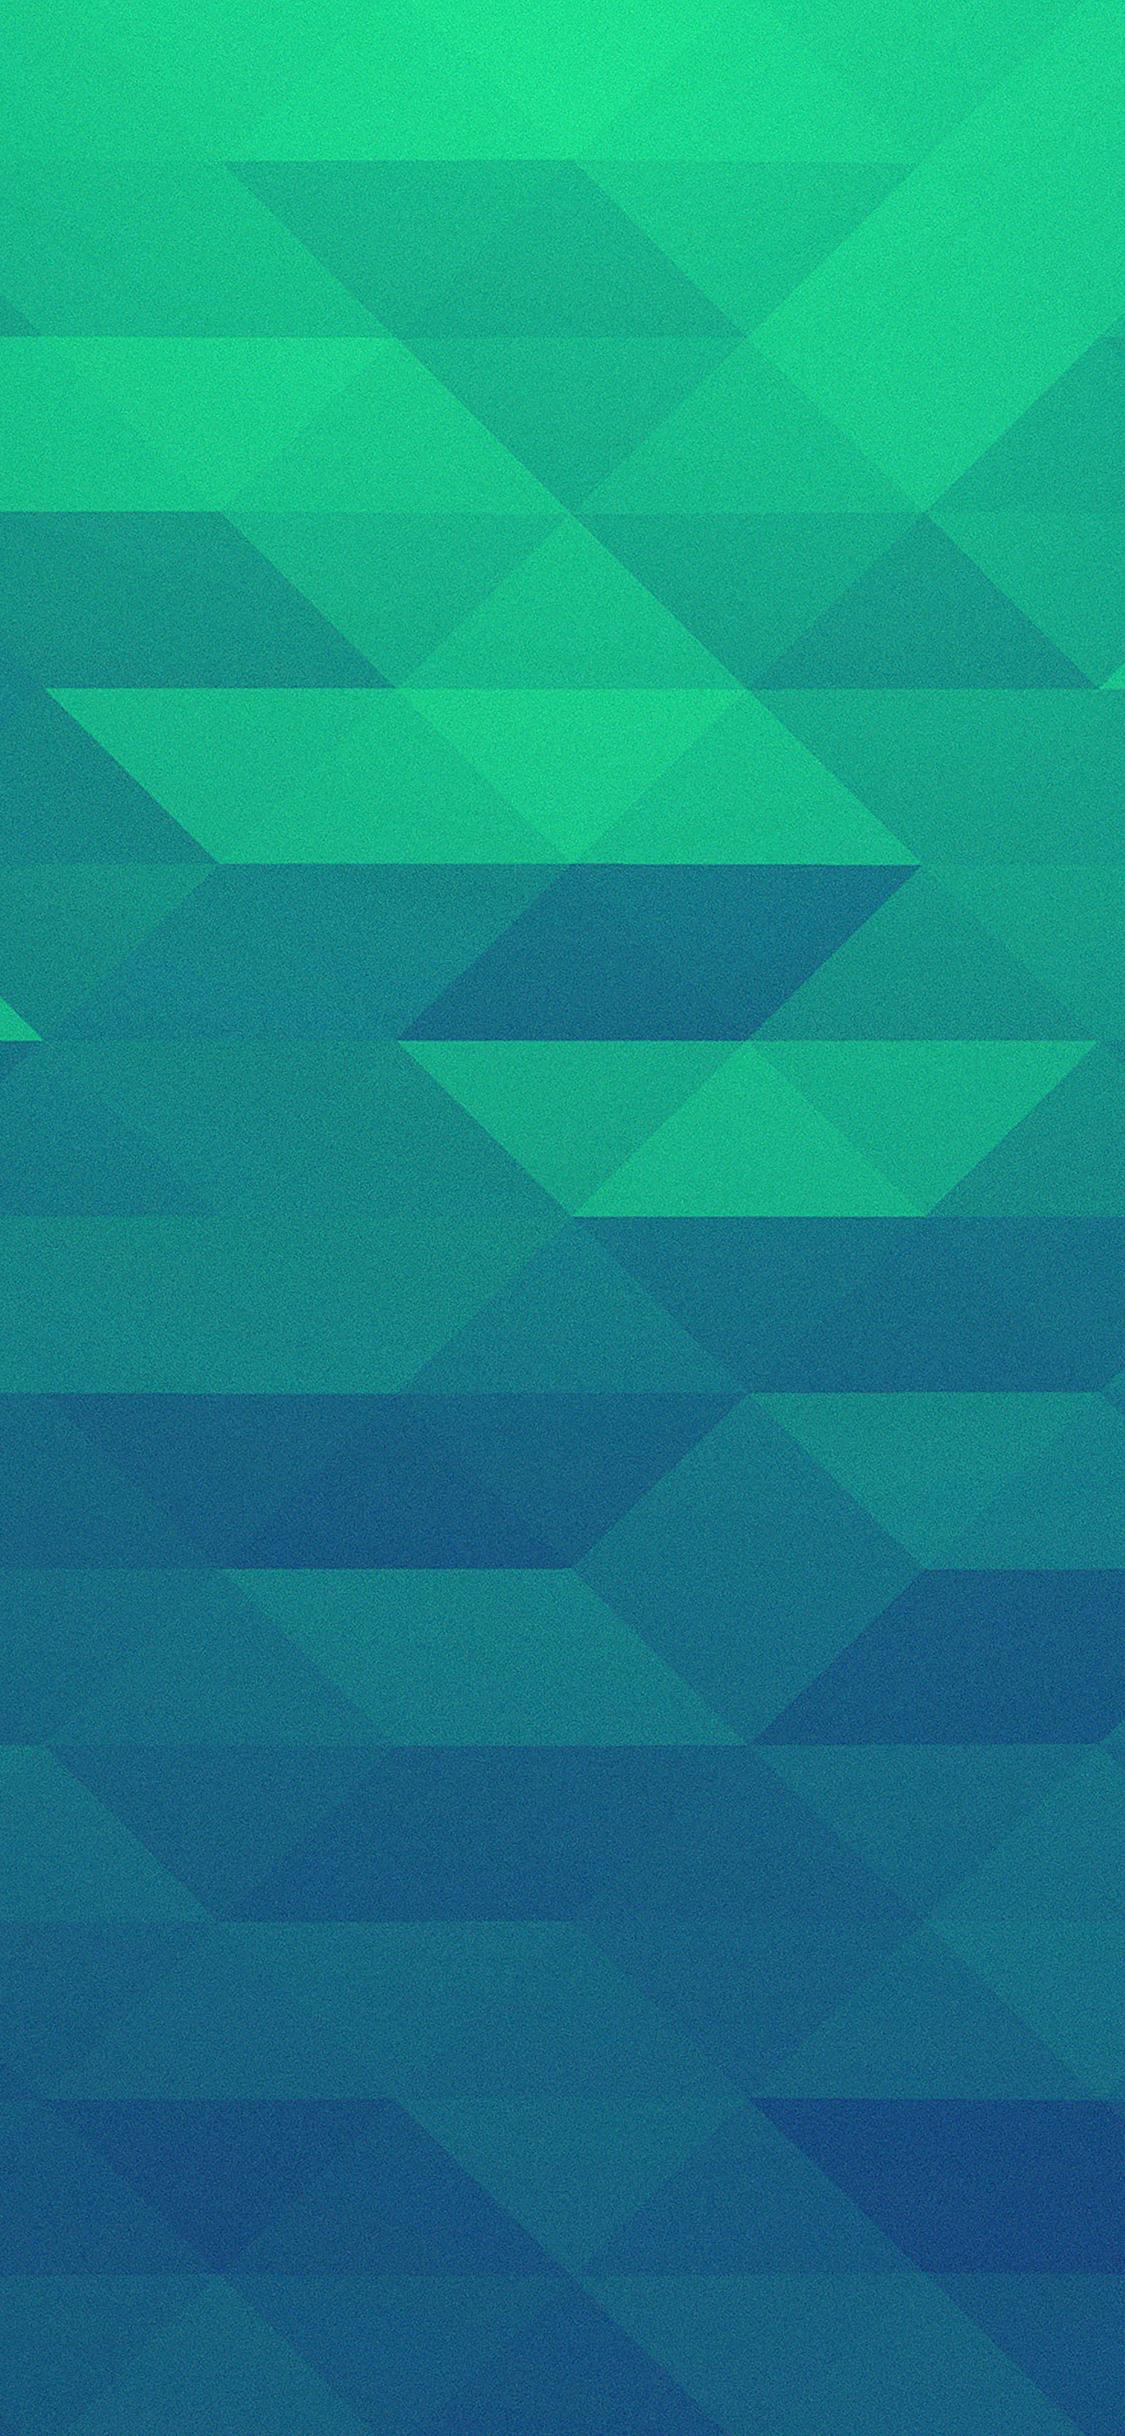 iPhoneXpapers.com-Apple-iPhone-wallpaper-vb10-wallpaper-green-blue-patterns